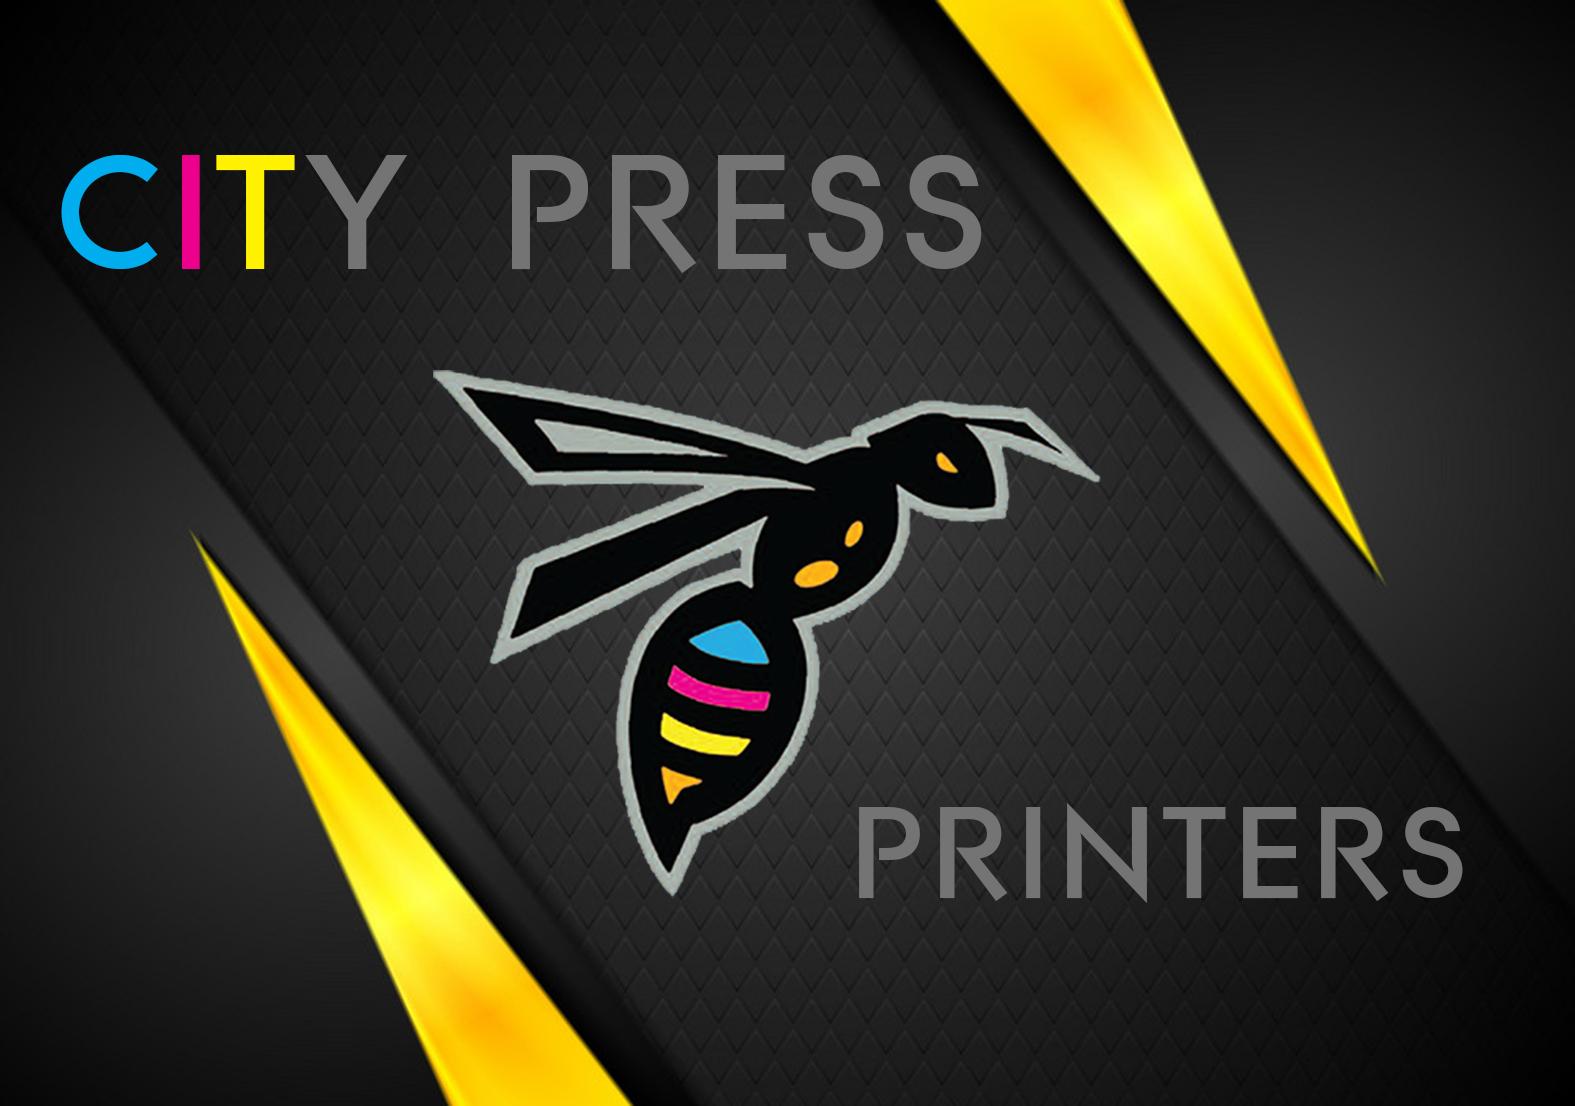 City Press Printers, Brechin DD9 6DY